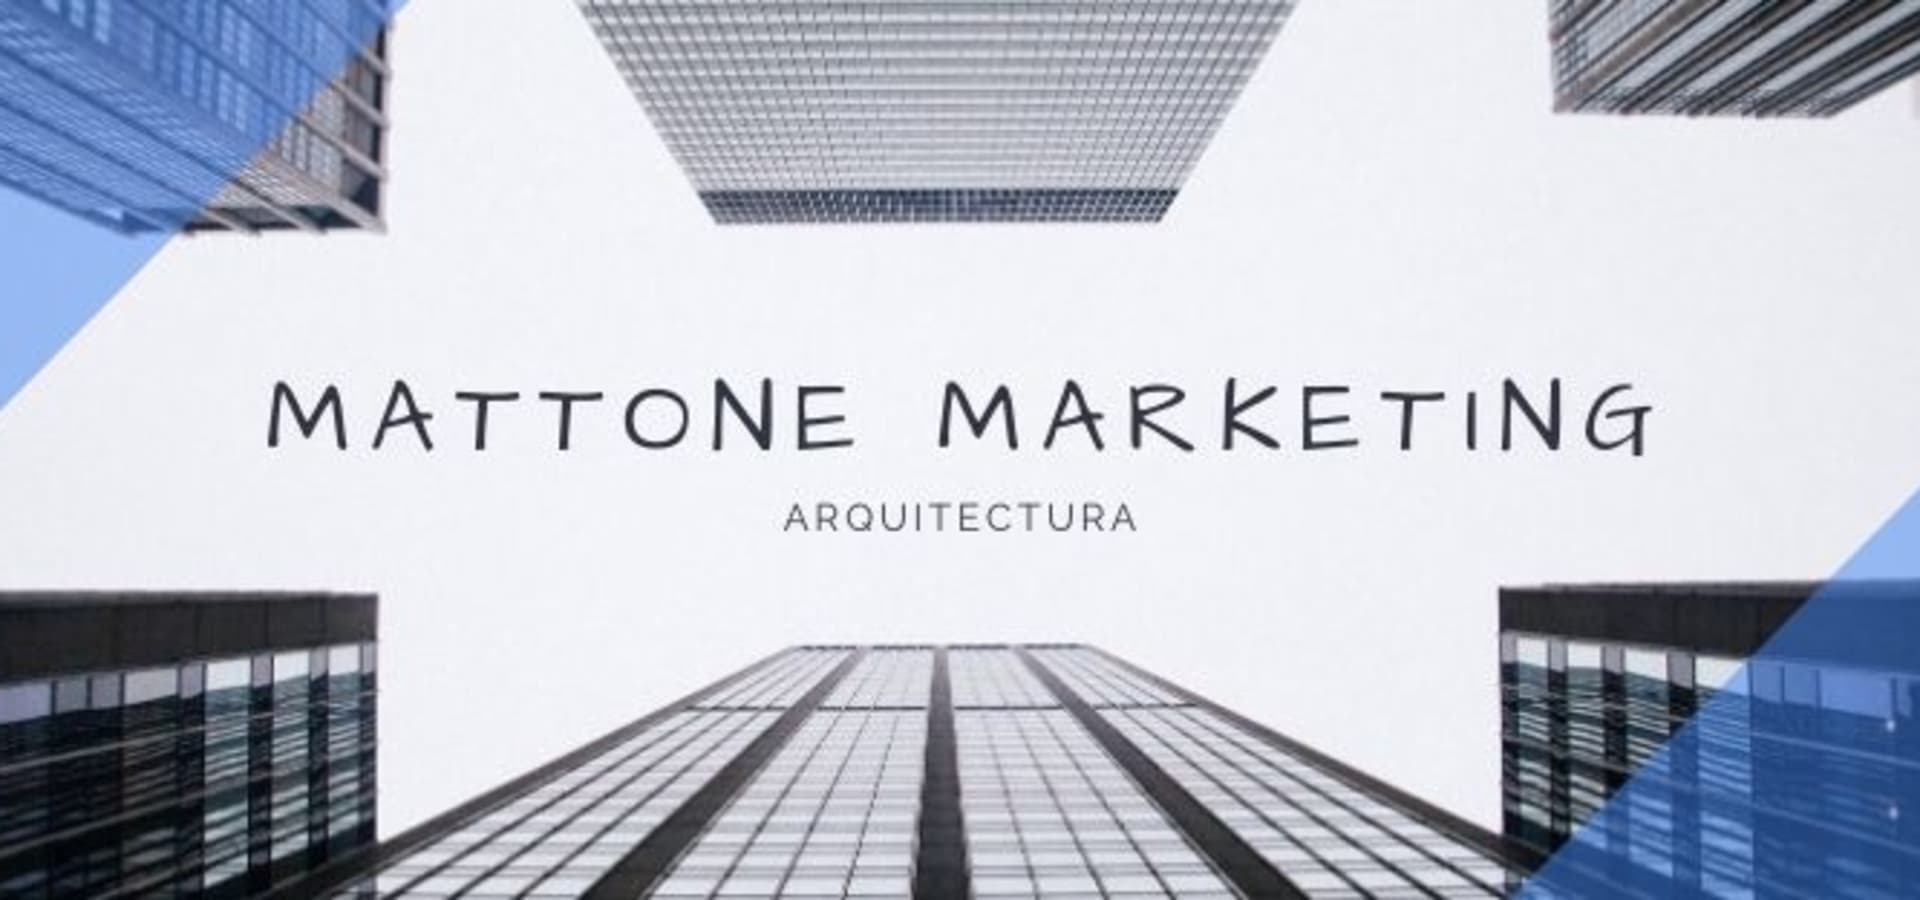 Mattone Marketing